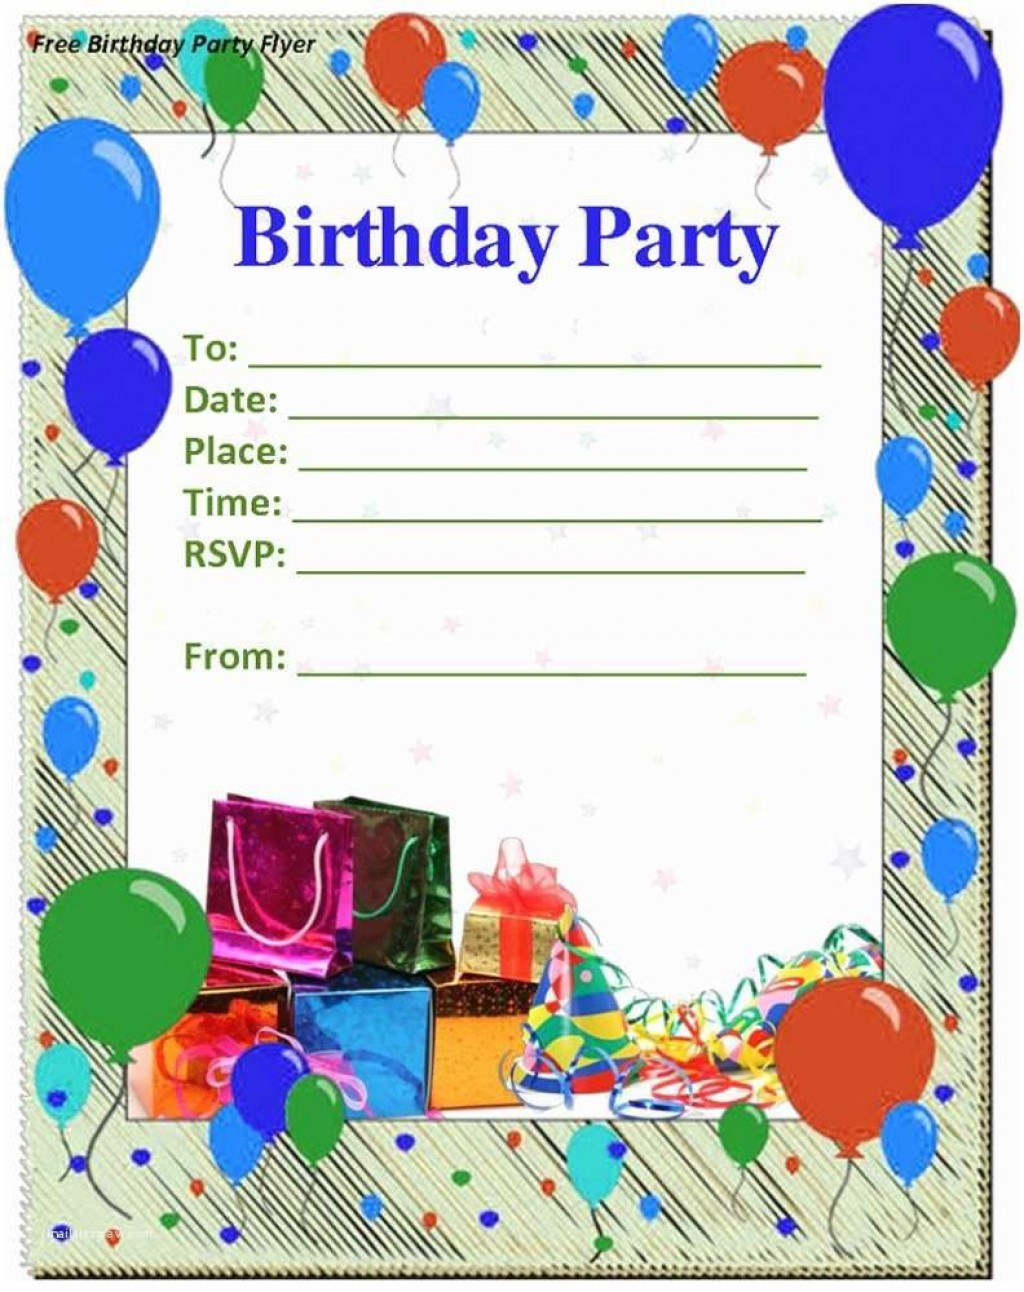 003 Stunning Party Invitation Template Word Image  Dinner Summer Wording Sample Unicorn BirthdayLarge